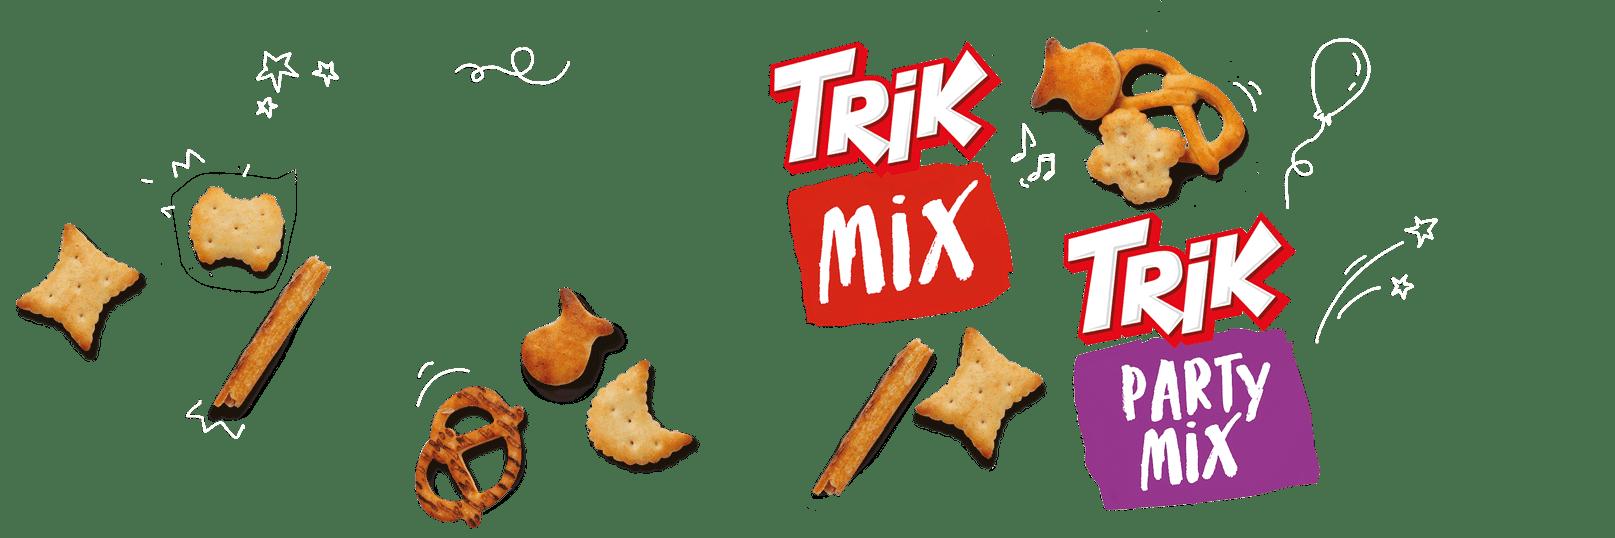 Trik mix